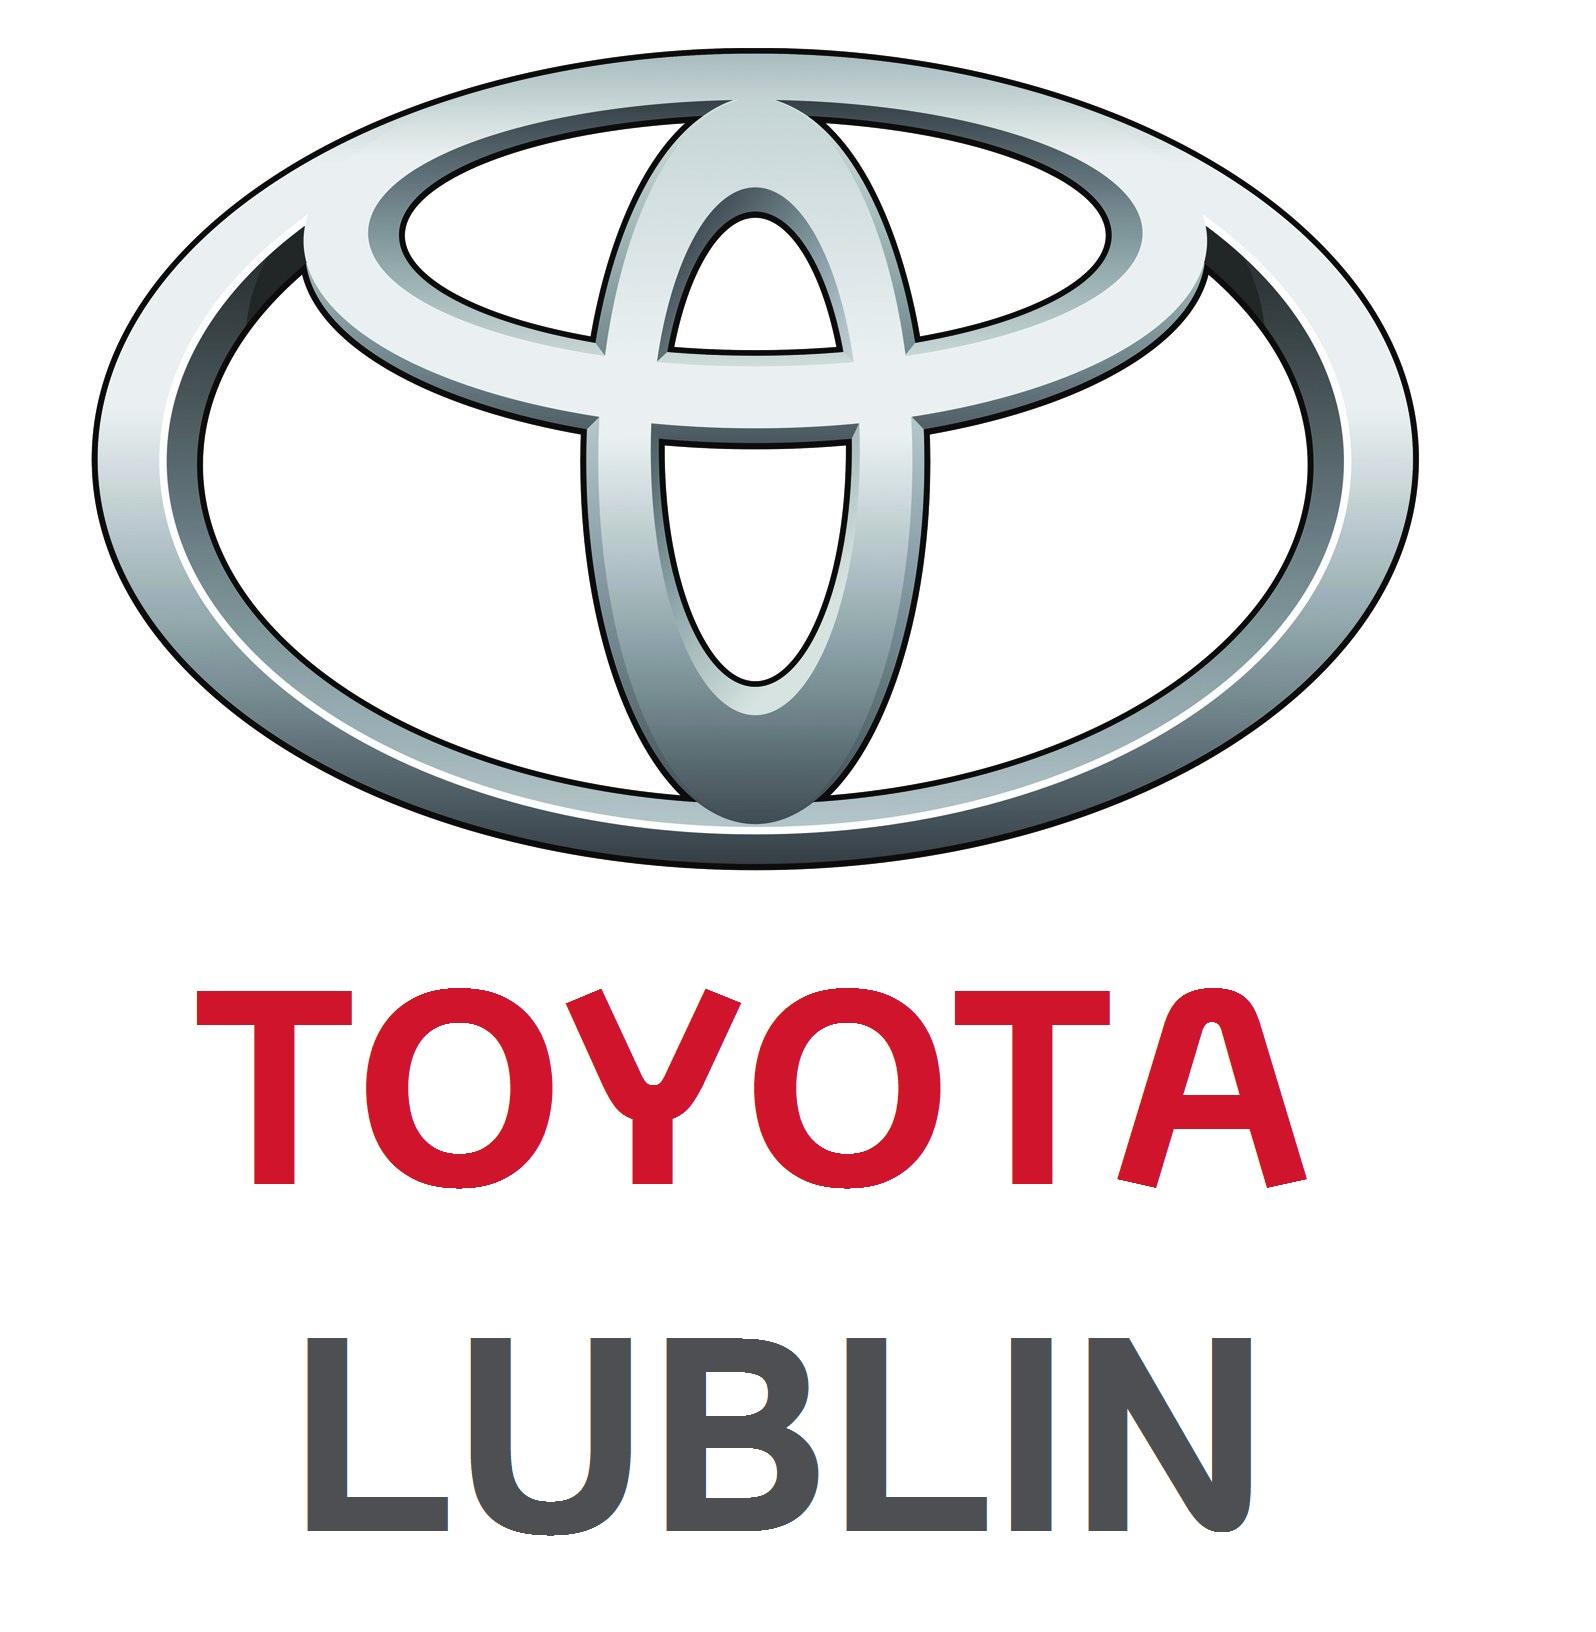 Toyota Lublin